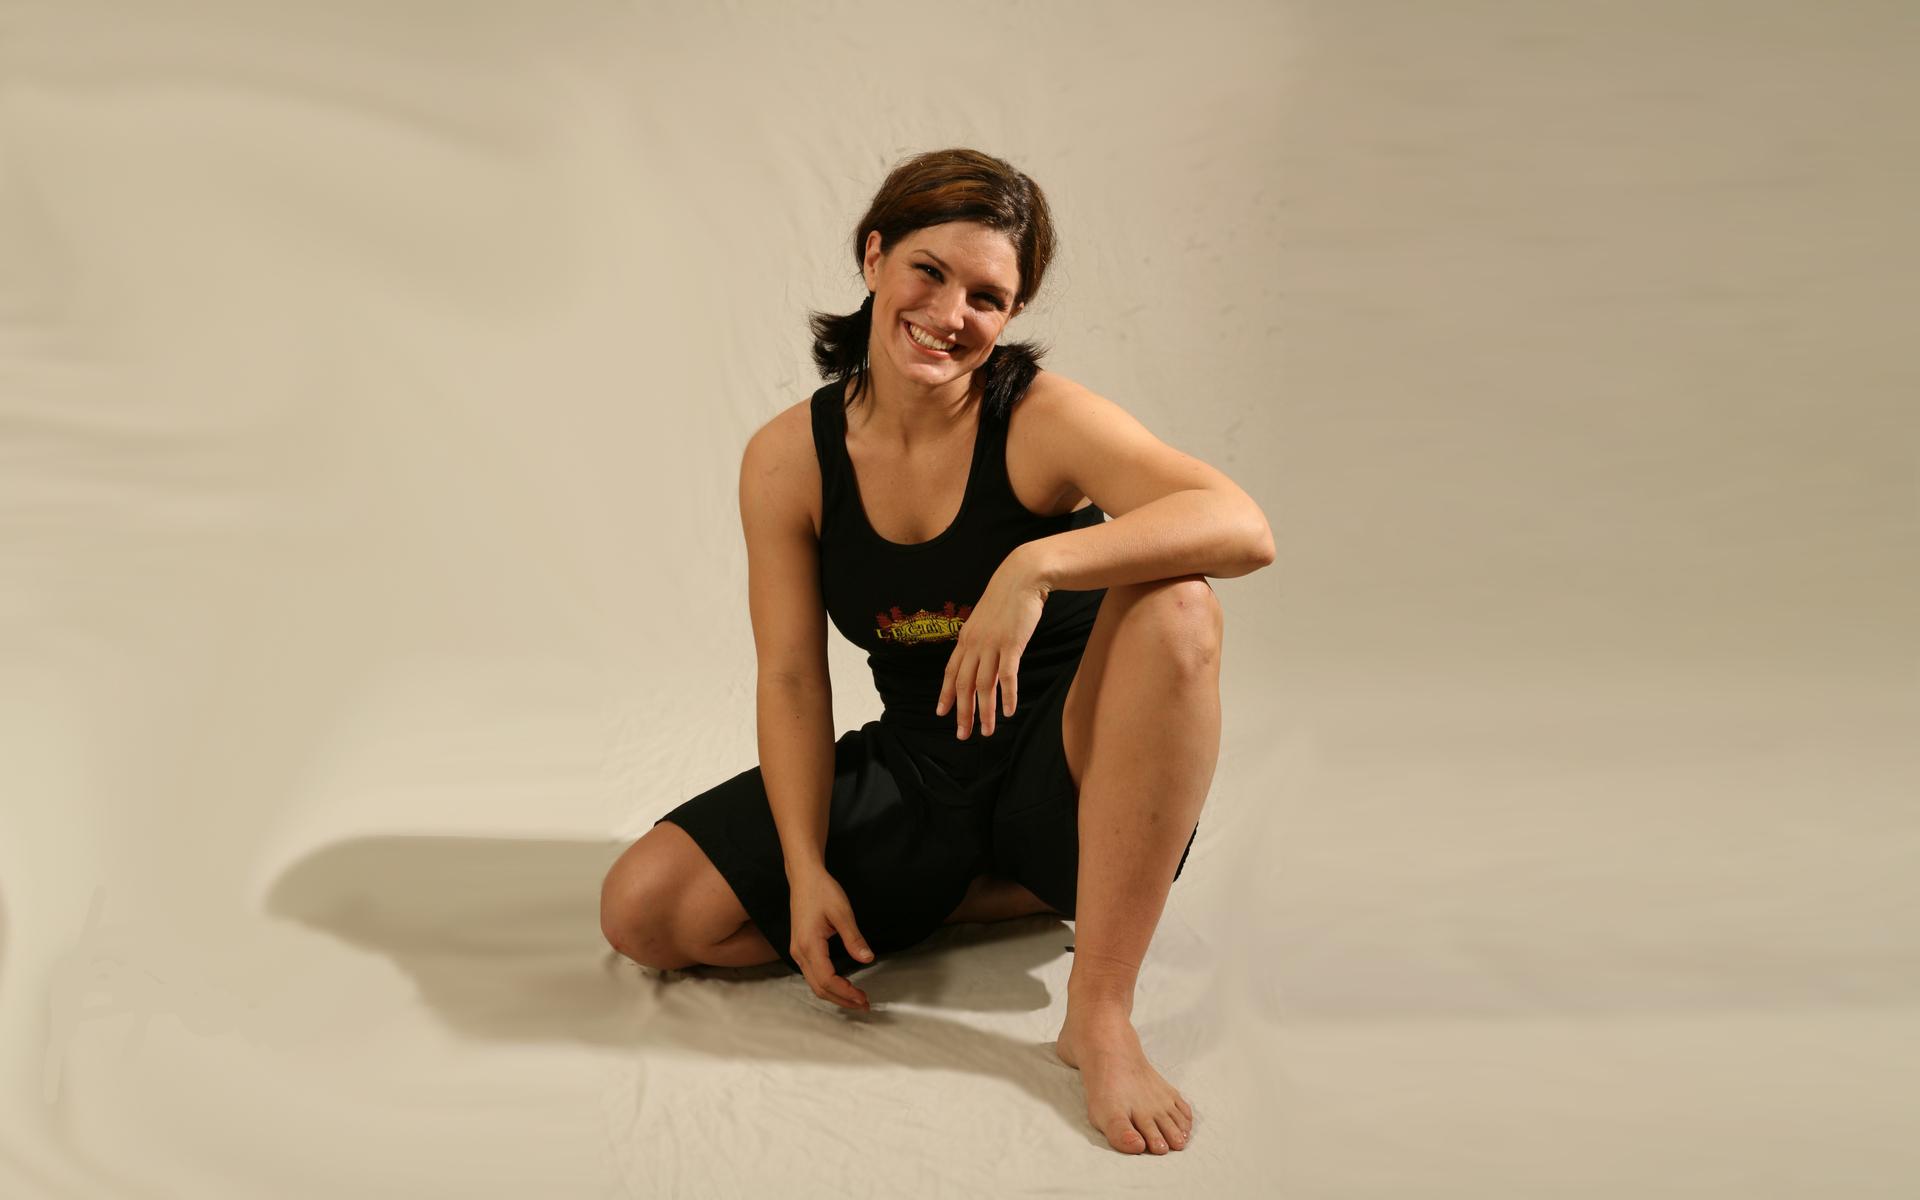 Jessie James Ex Wife Naked Pics